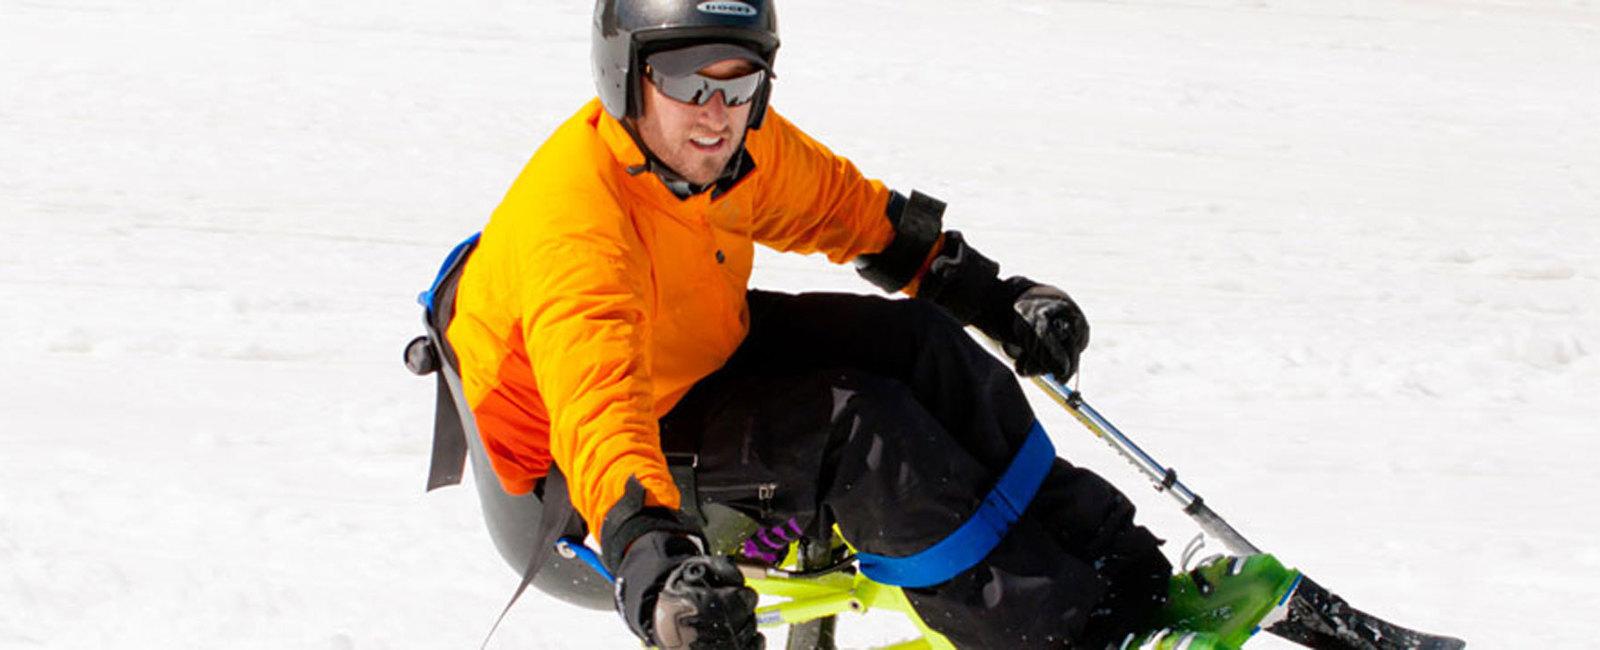 Snowbasin Adaptive Sports